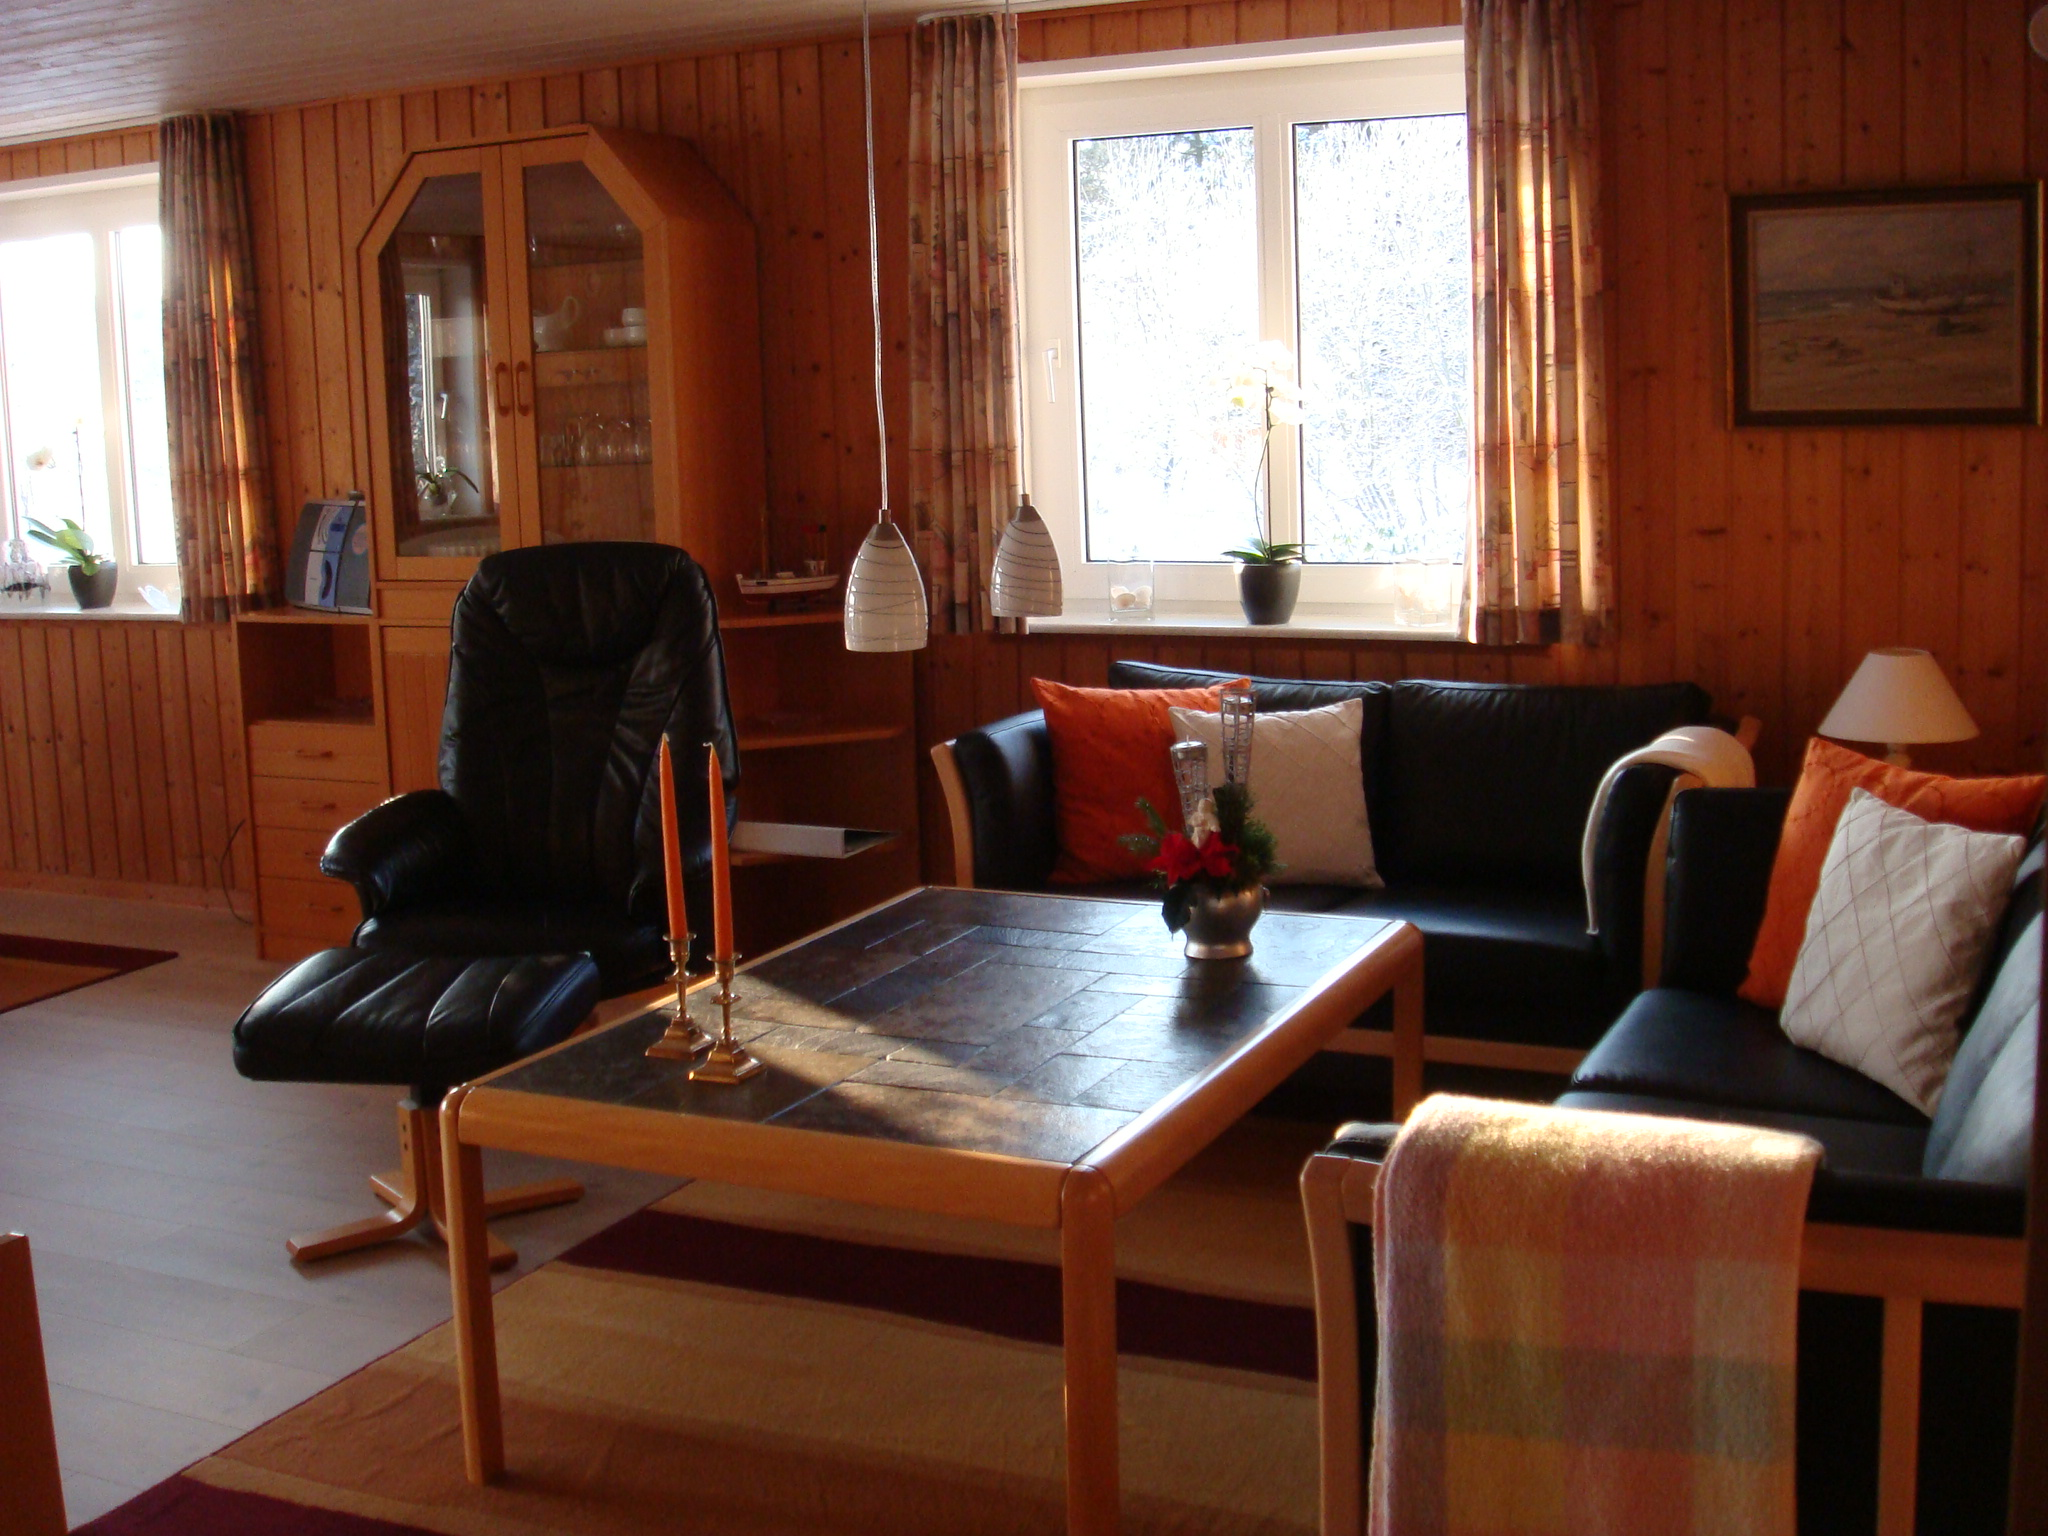 Ferienhaus 1184 - Hausfoto 2